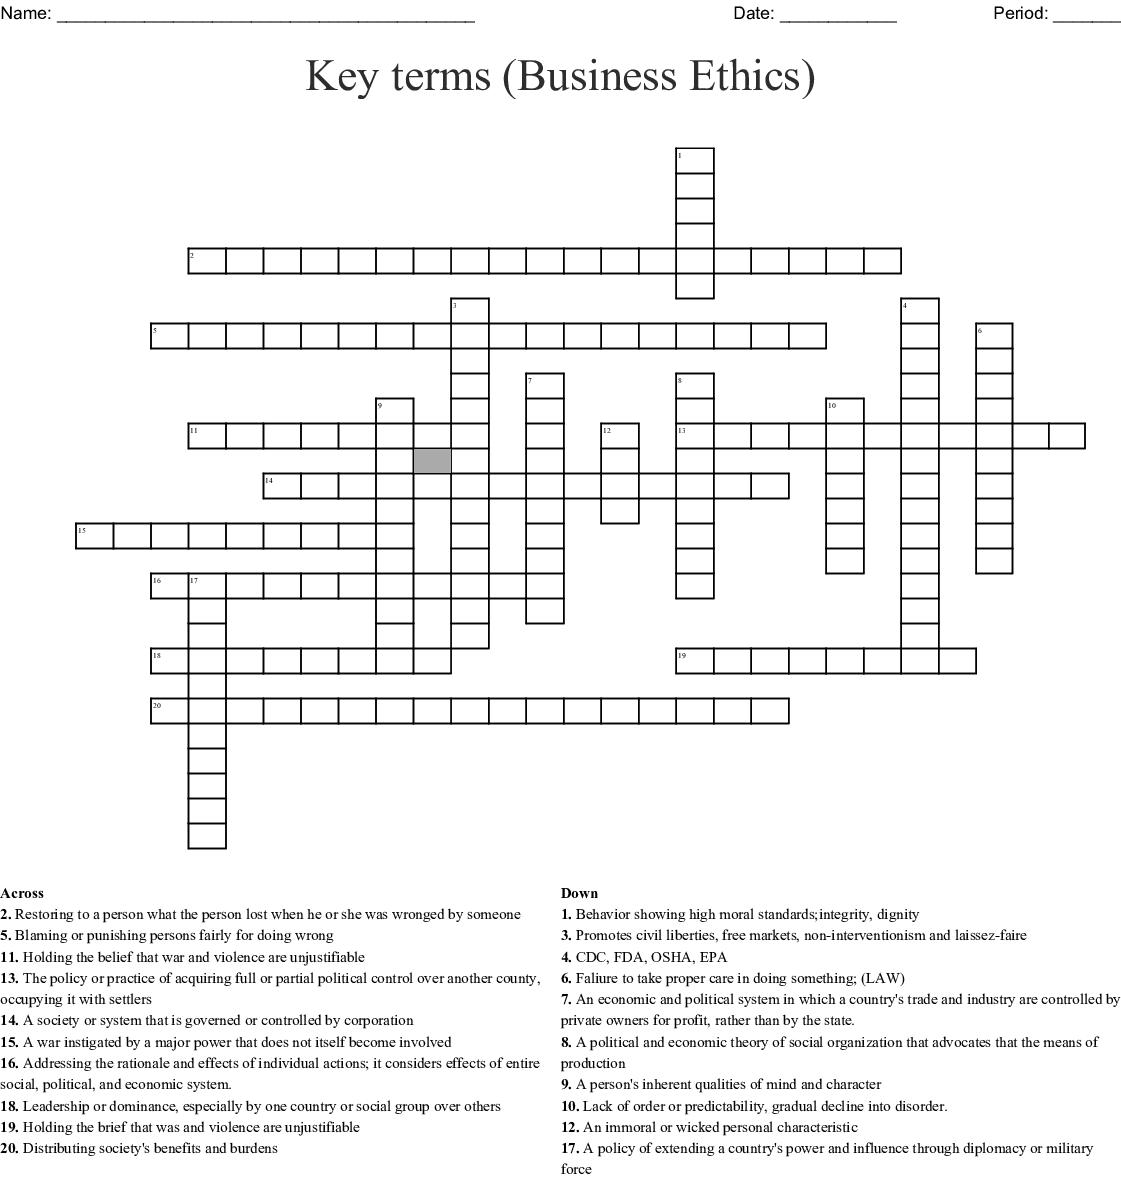 Key Terms Business Ethics Crossword Wordmint